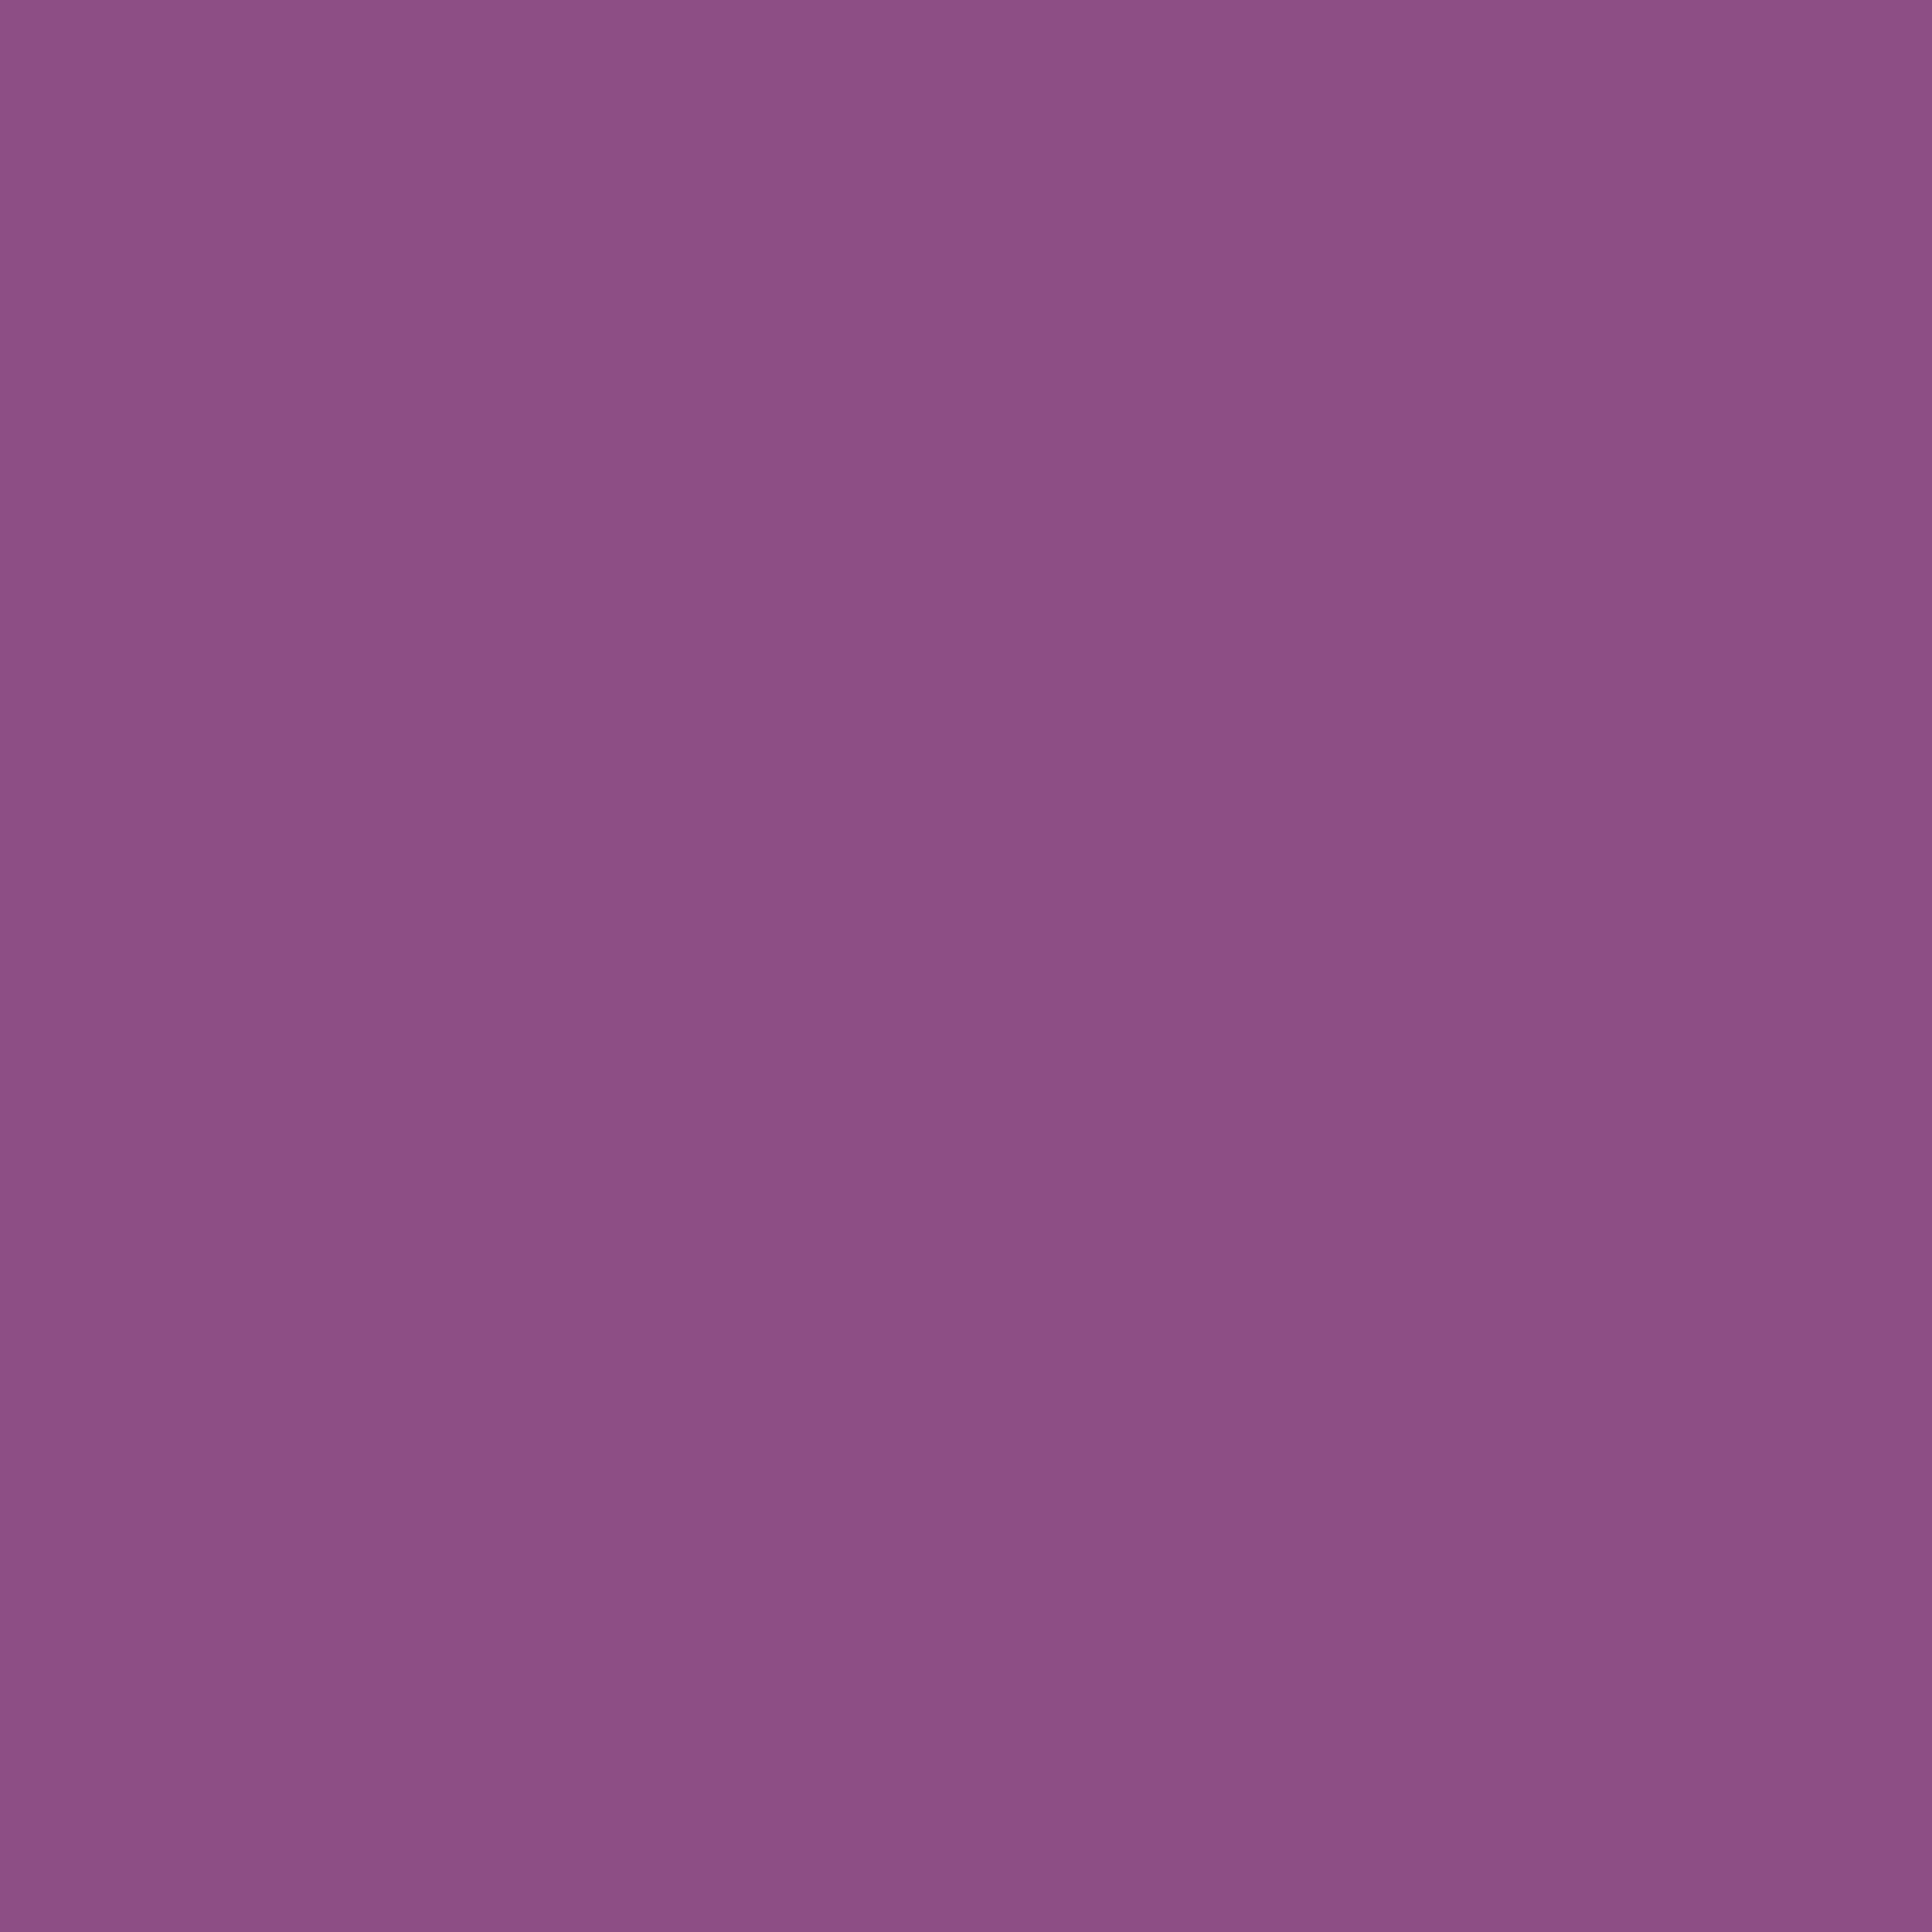 3600x3600 Razzmic Berry Solid Color Background